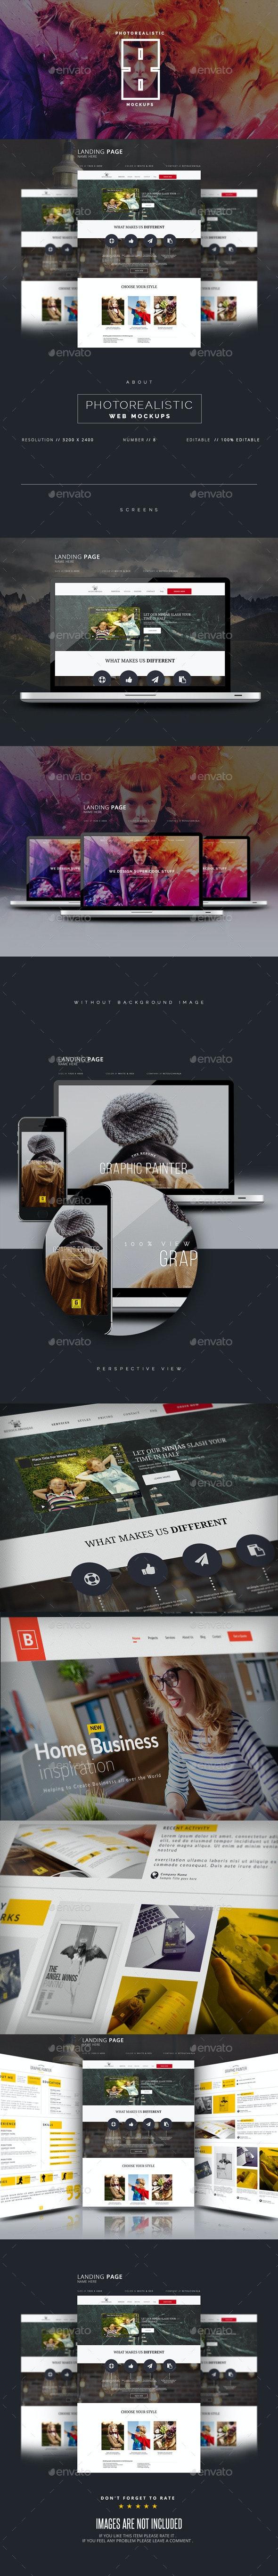 Photorealistic Website Display Mockup - Website Displays